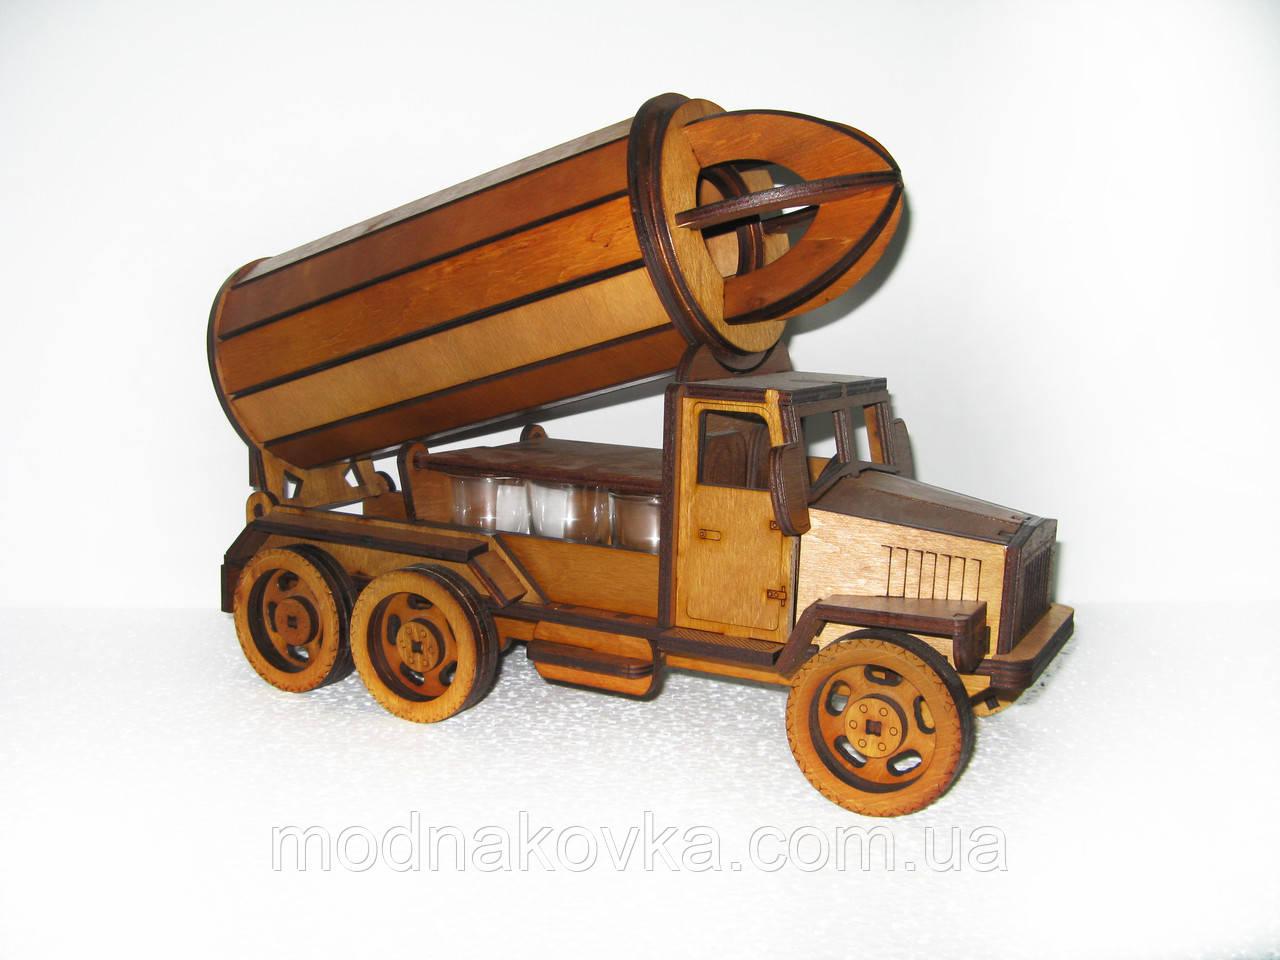 Мини-бар с рюмками деревянный Урал